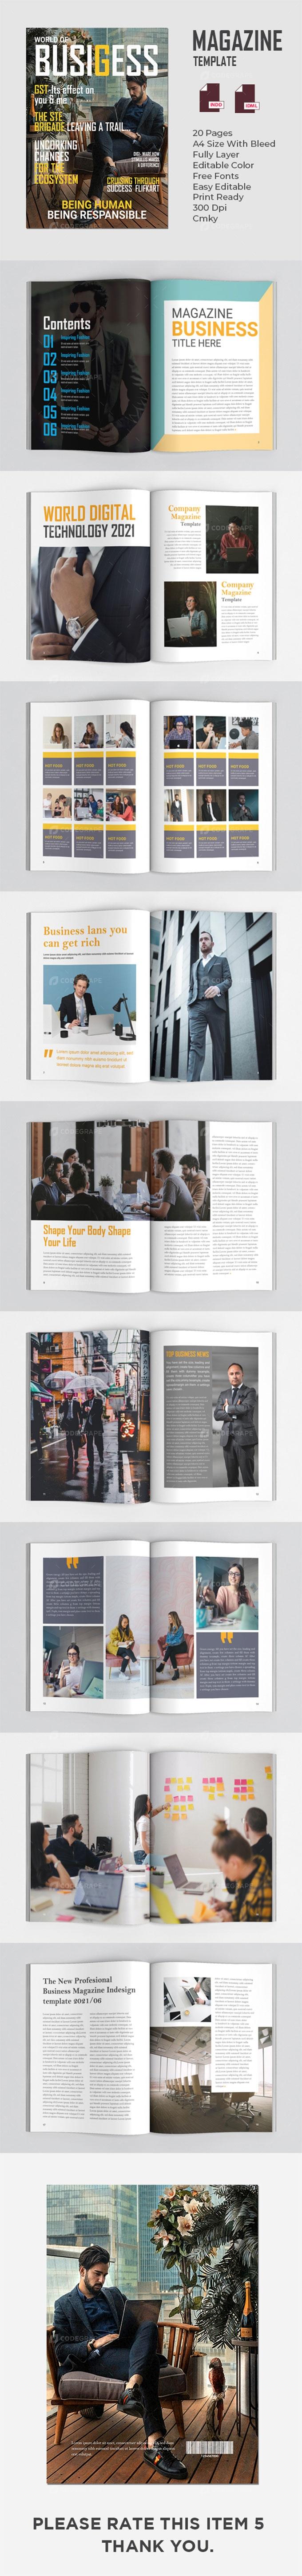 Business Magazines